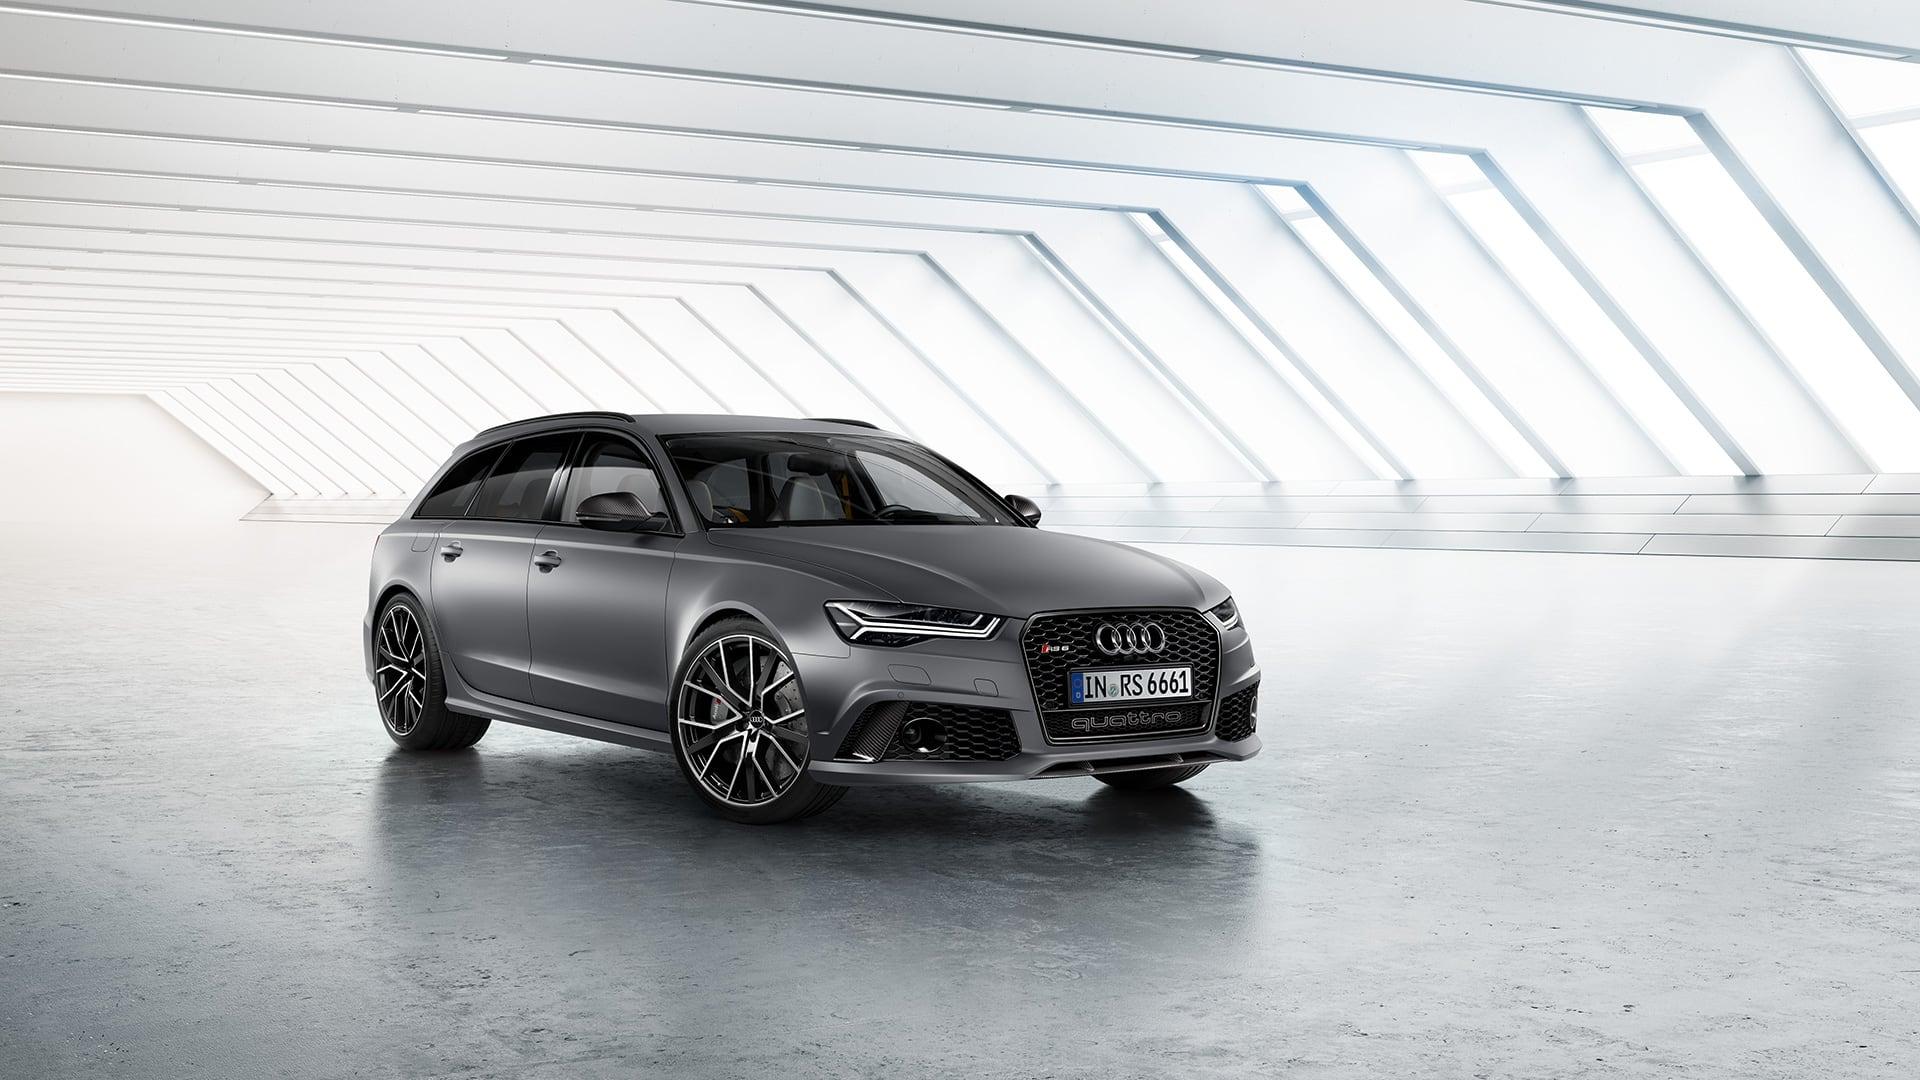 Audi RS6 Avant > Audi A6 > Audi Saudi Arabia